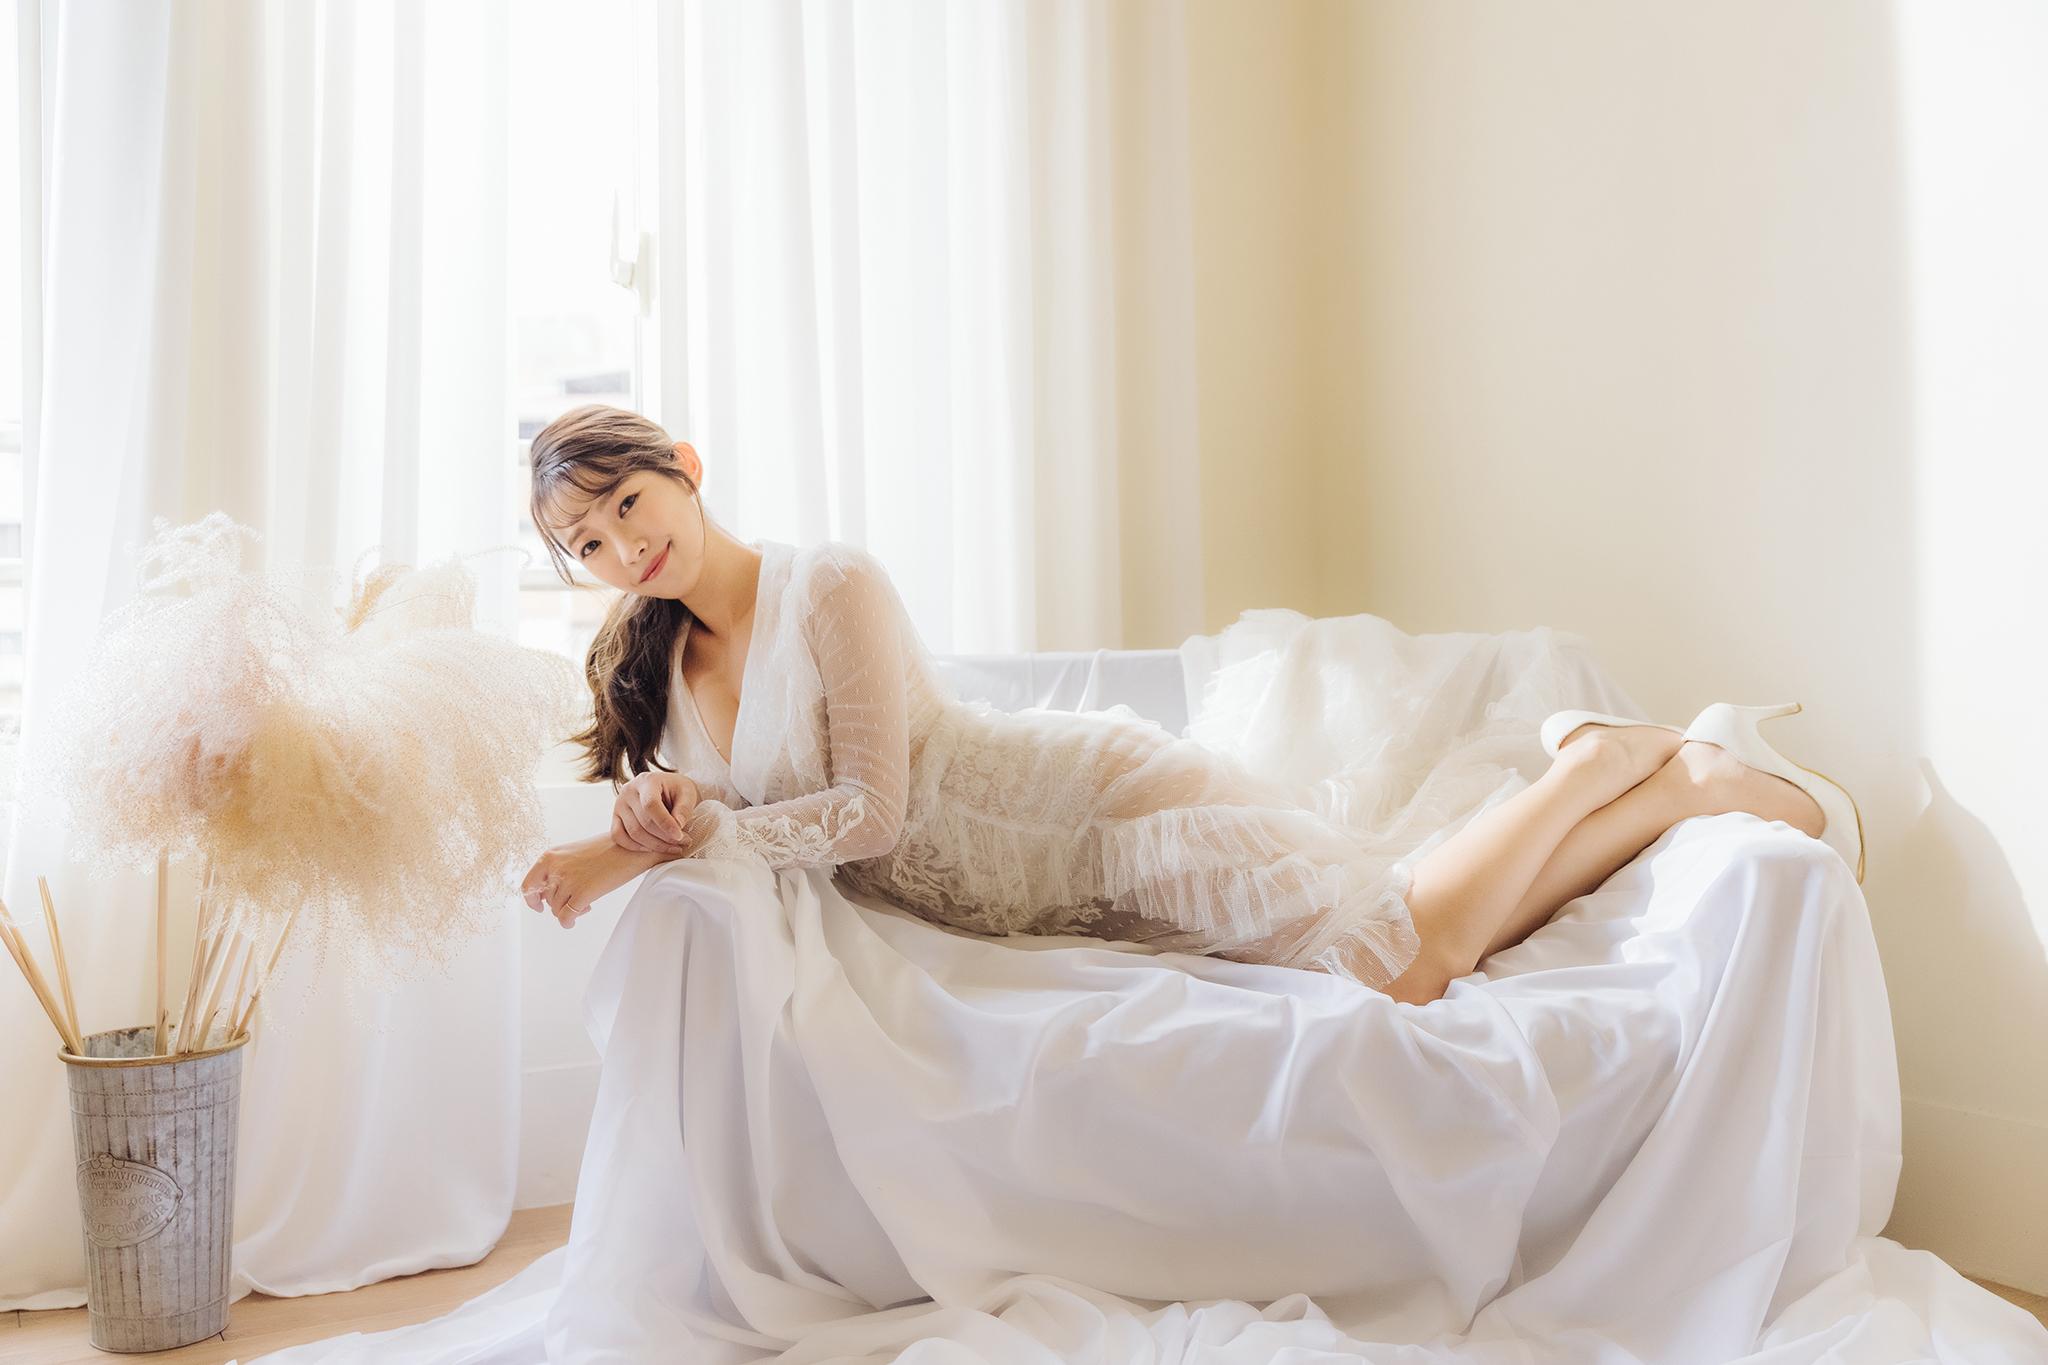 51576641027 6bd8671fd5 o - 【自主婚紗】+江jiang+